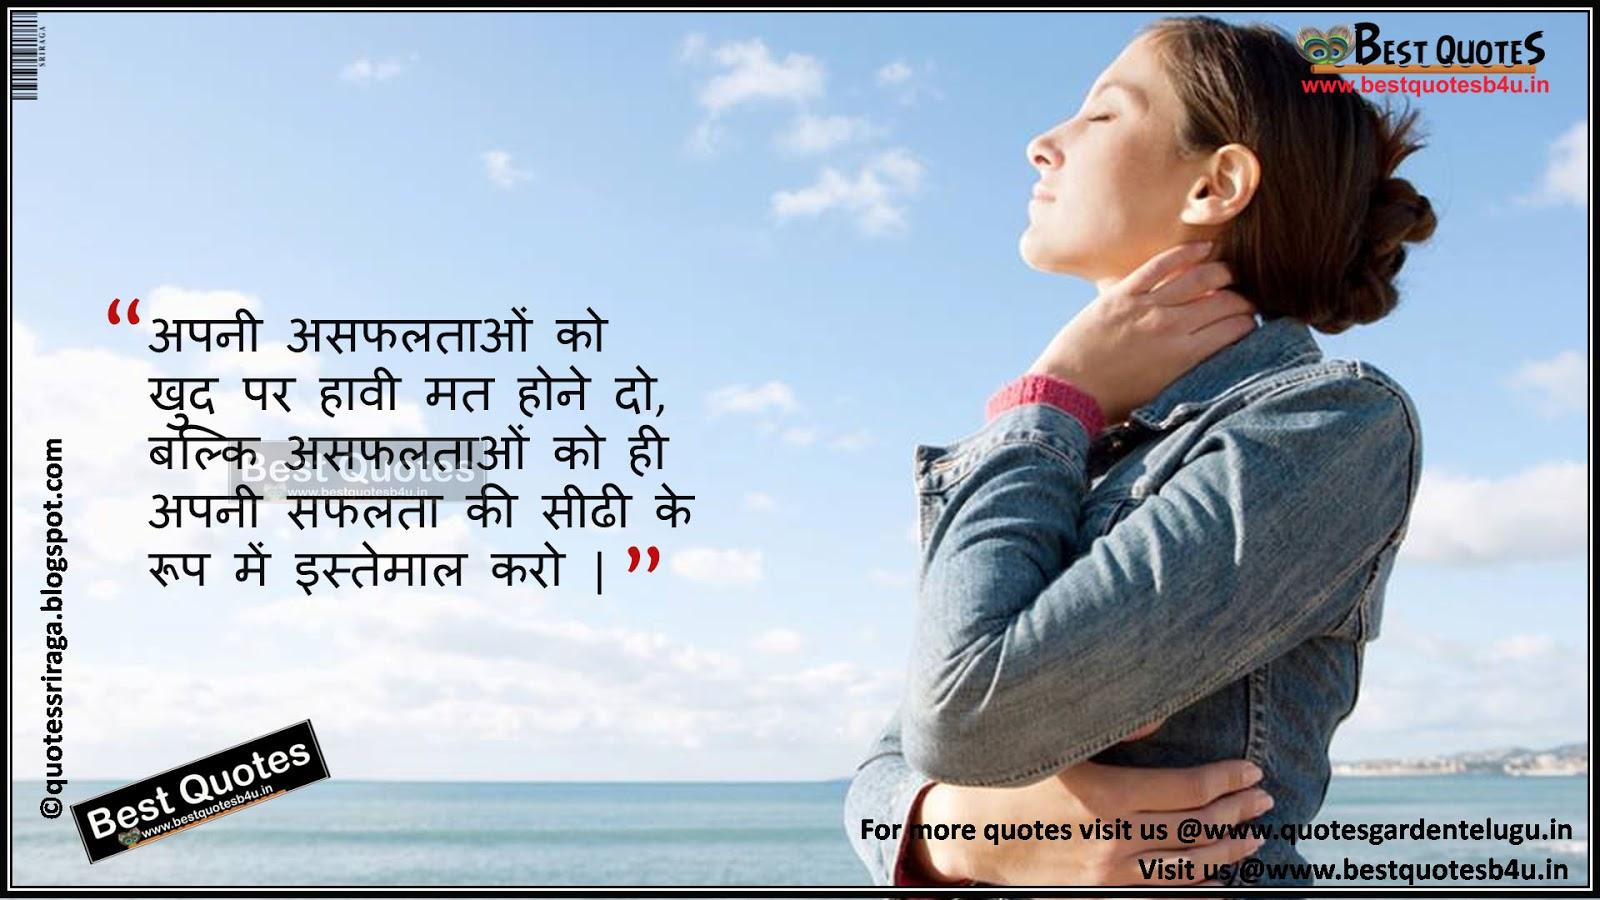 Nice Hindi inspirational Life Quotes sms   Like Share Follow